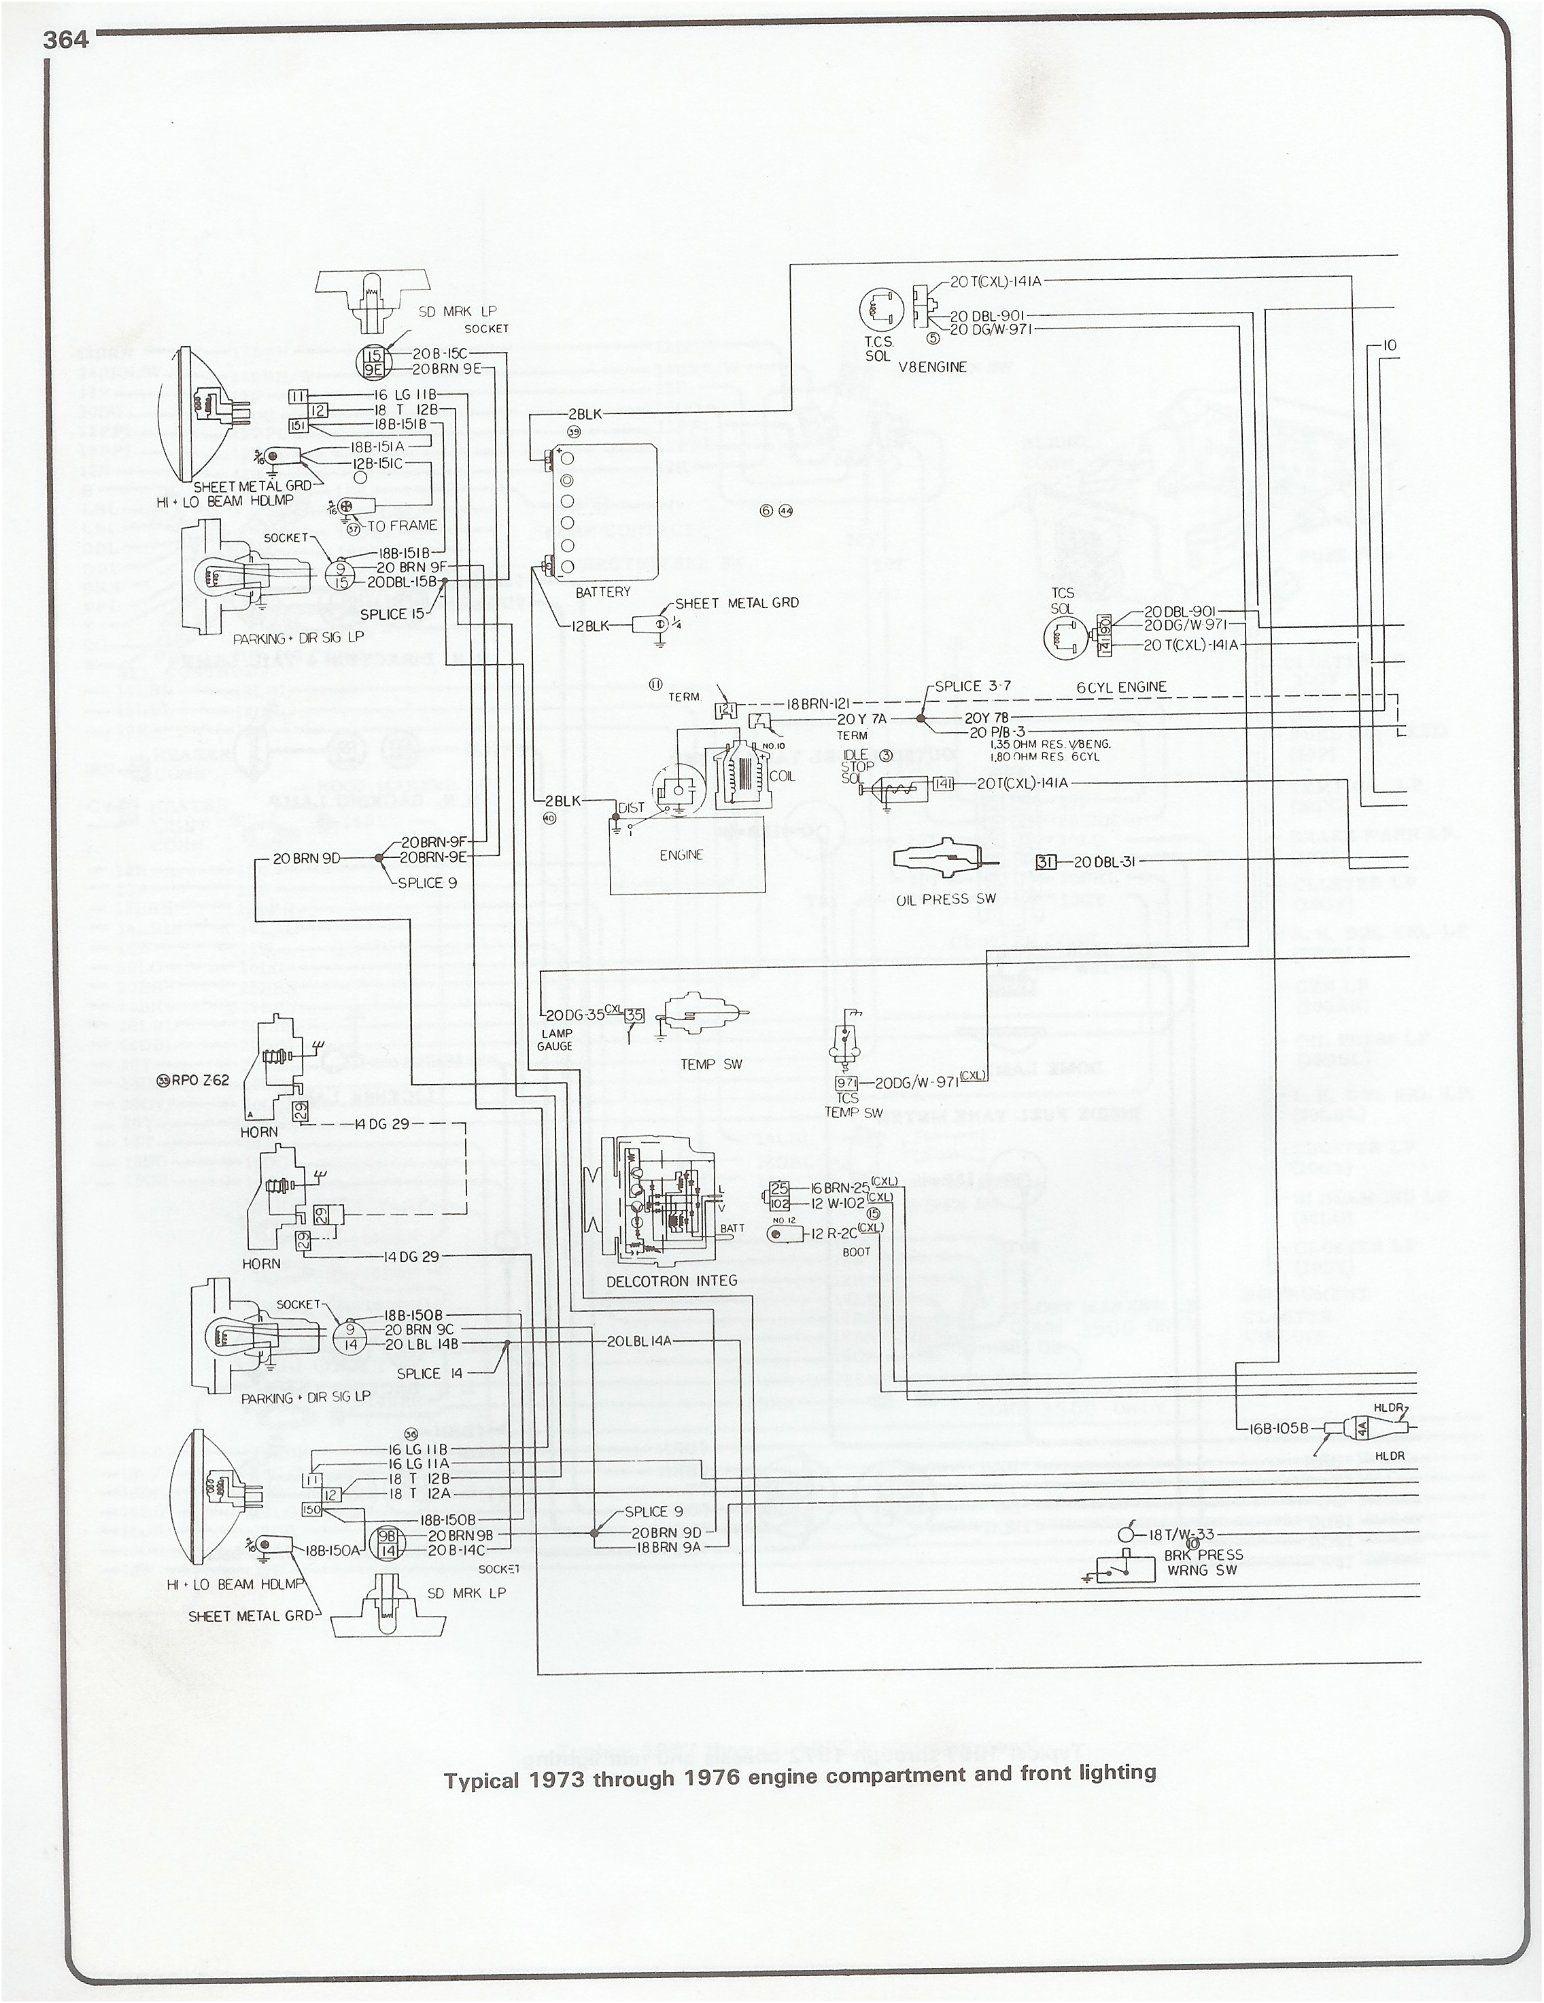 1974 Chevy Pickup Wiring Diagram 73 Chevy Wiring Diagram Wiring Diagram Technic